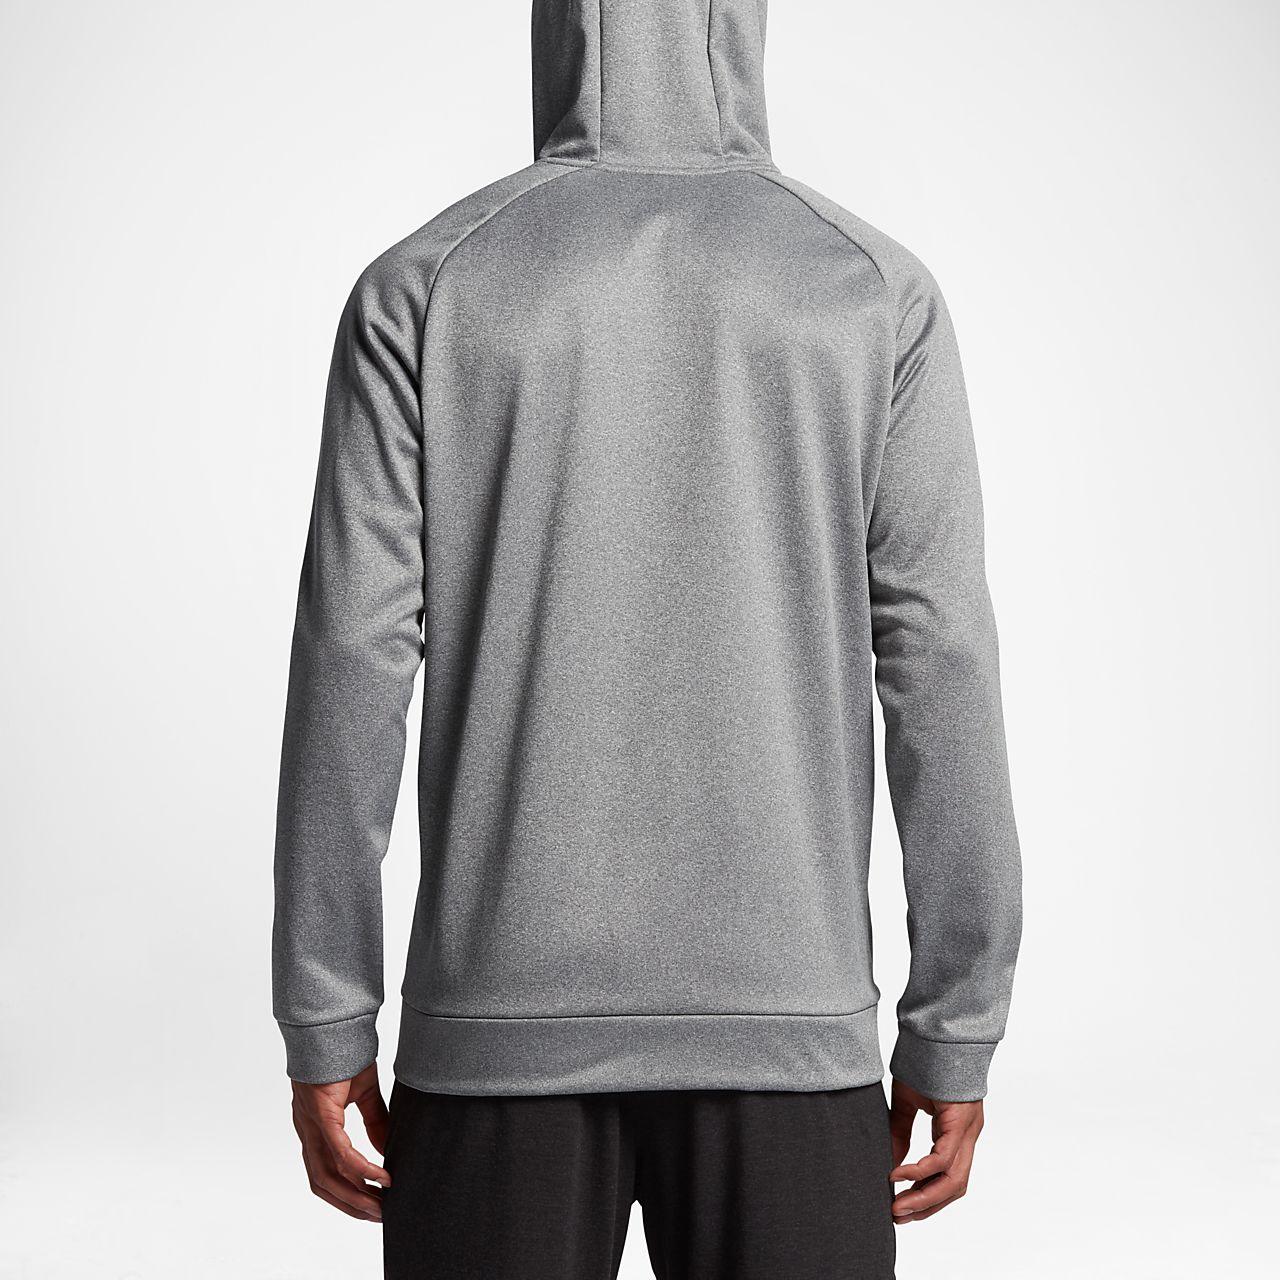 Nike Legend Poly Jacket Women Hoodies & sweatshirts Women Hoodies & sweatshirts COLOUR-black